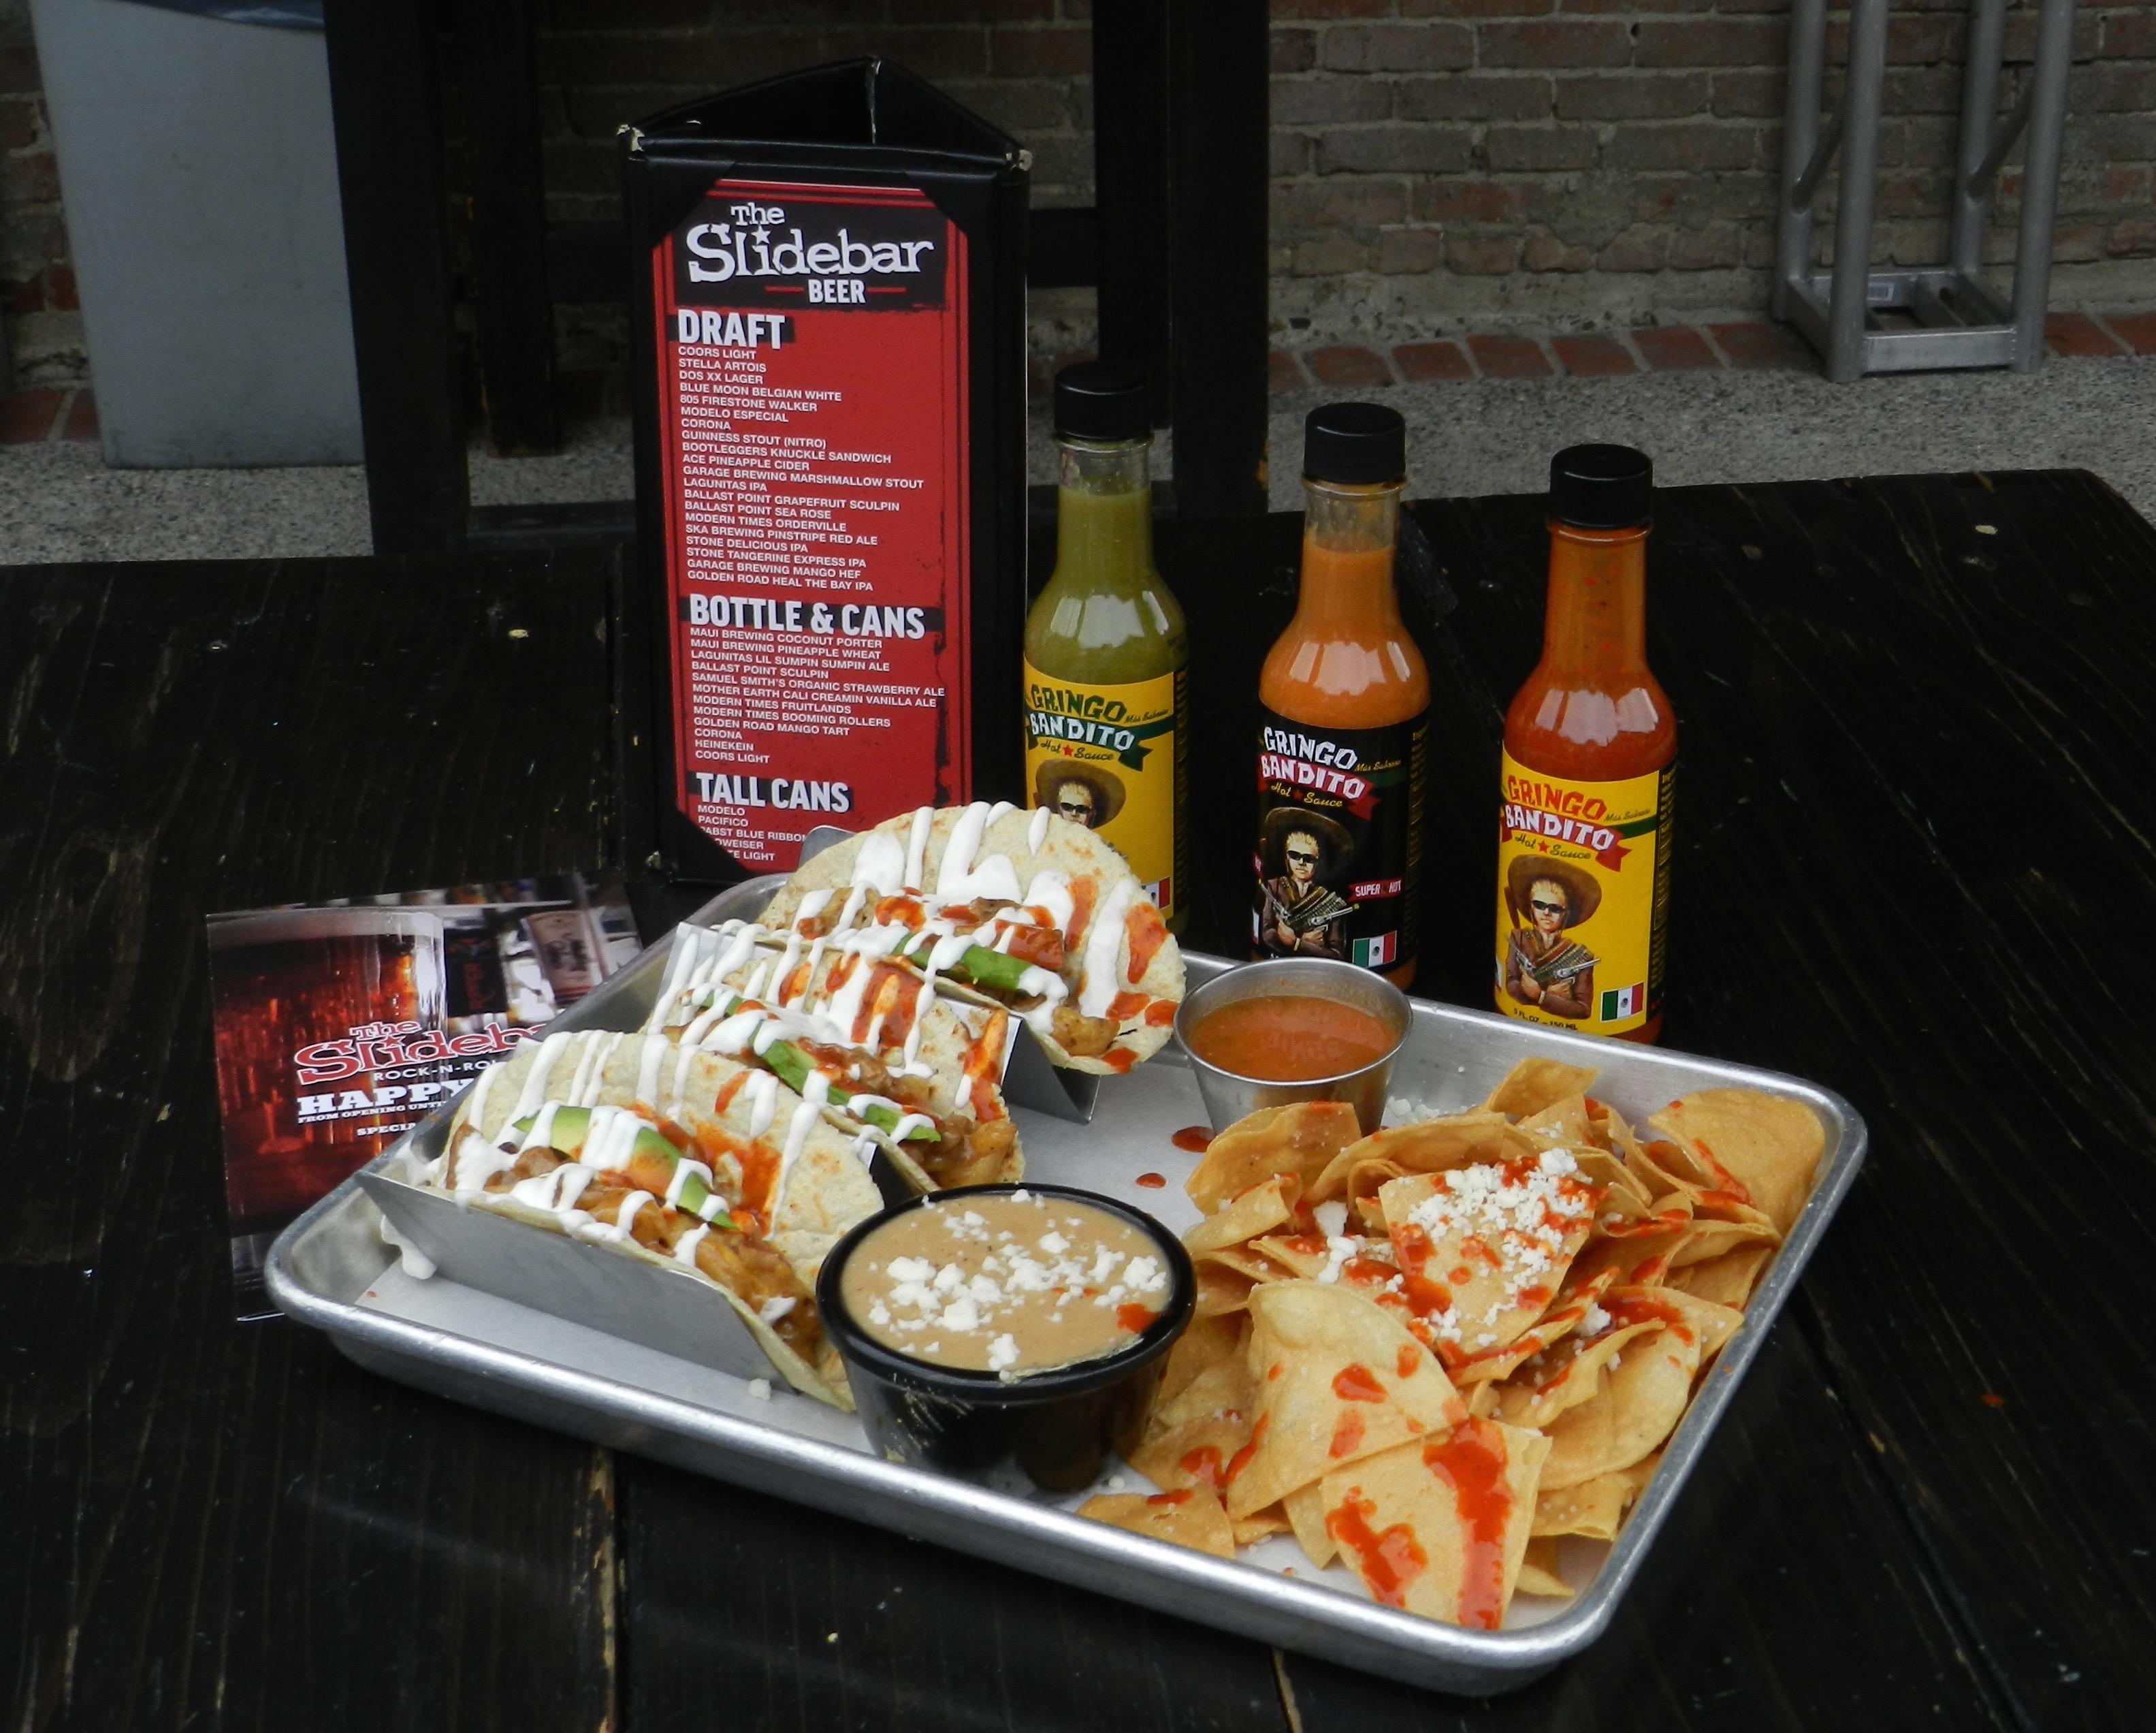 Slidebar in Fullerton, CA: Gringo Bandito Hot Sauce And A